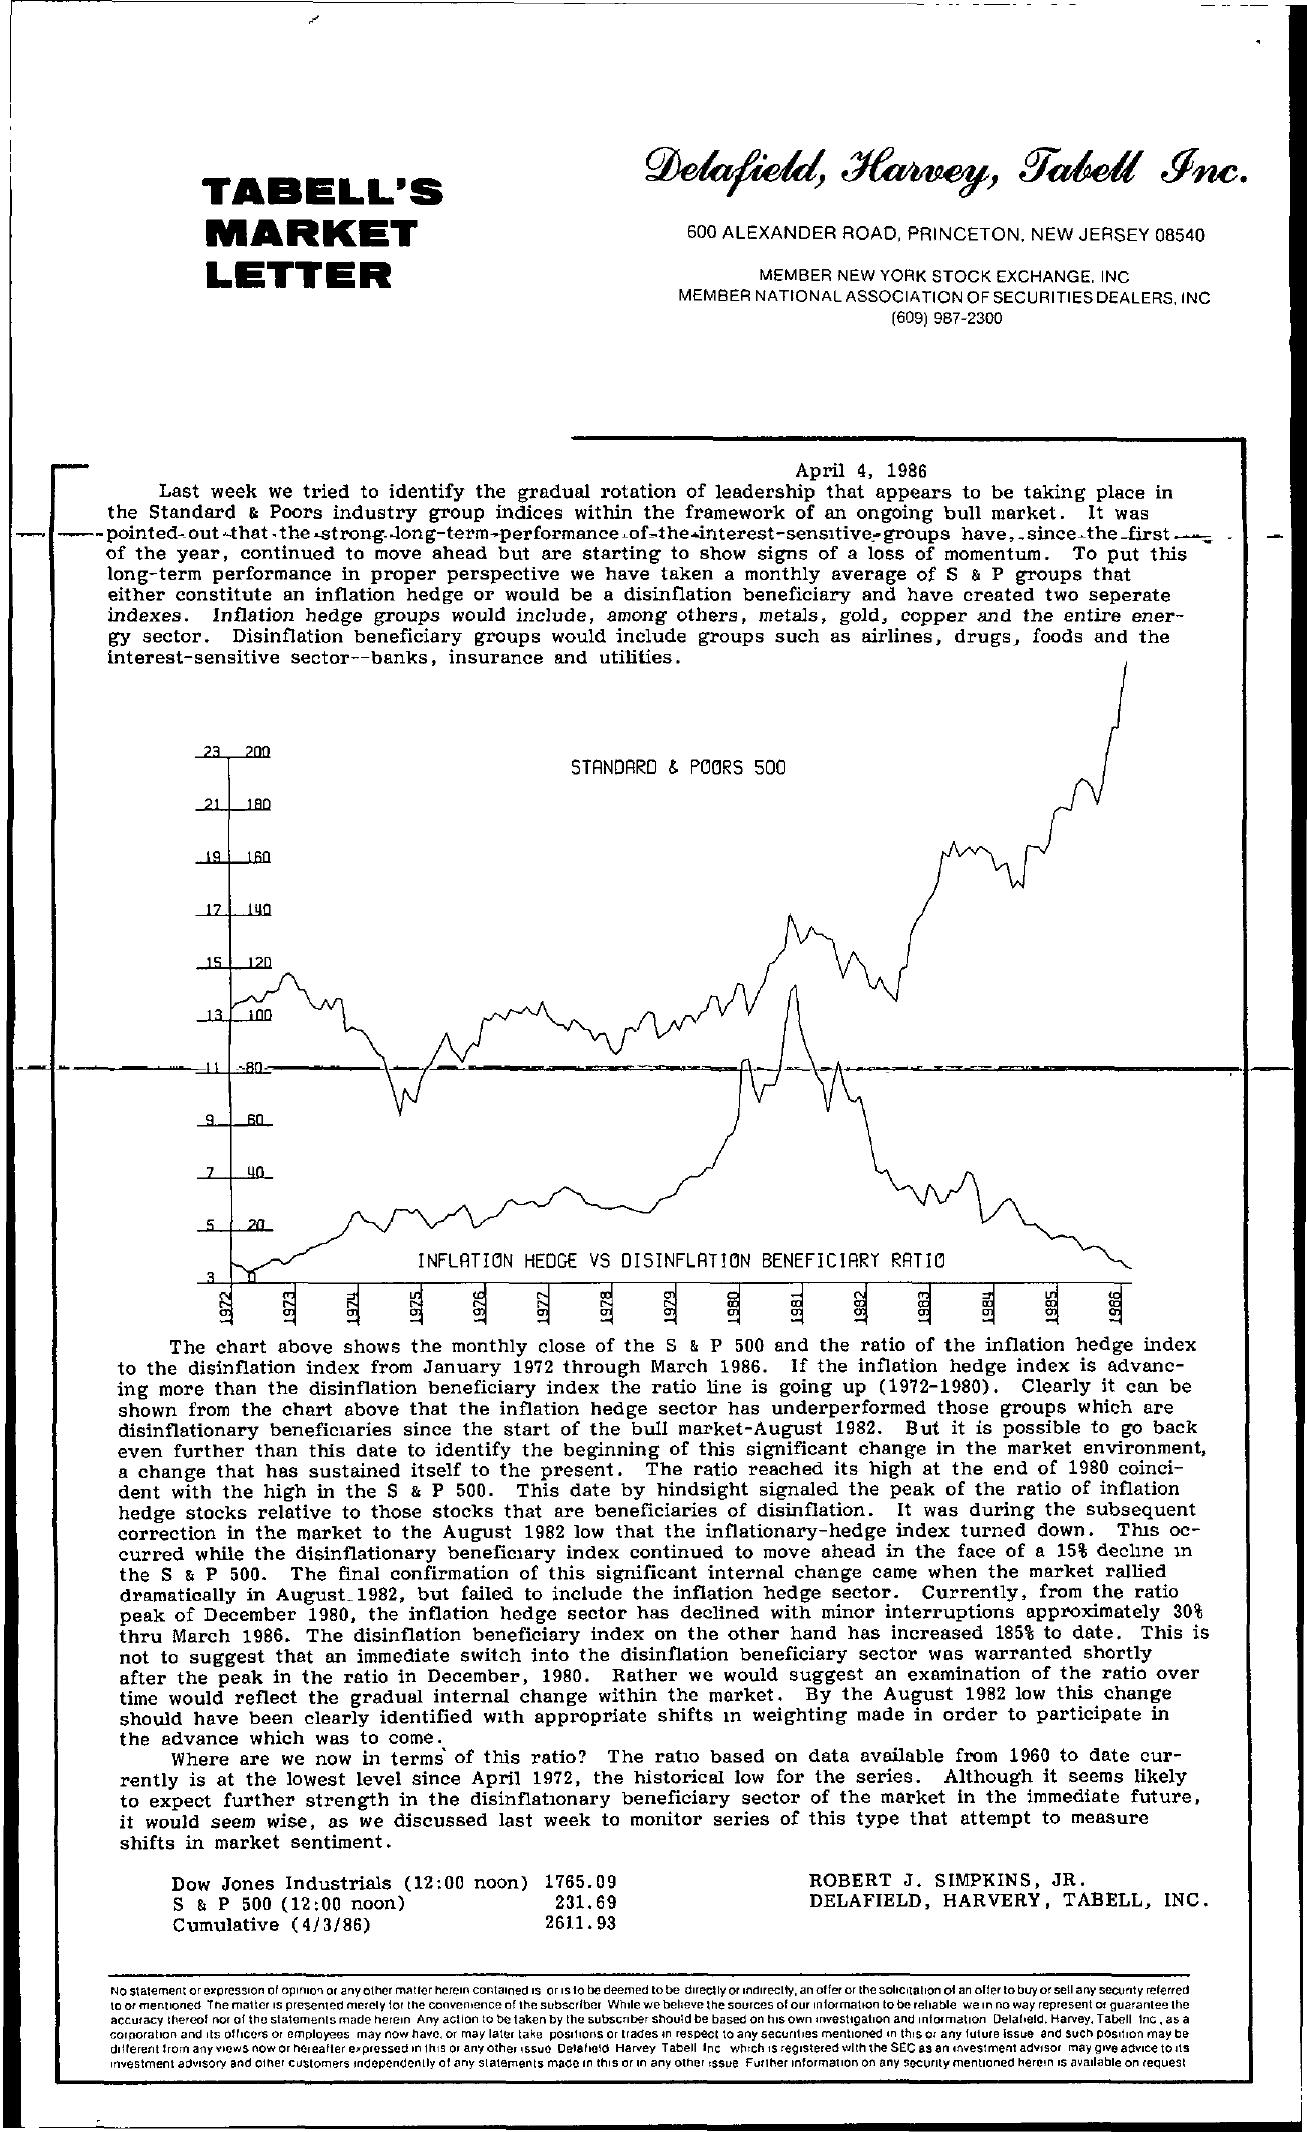 Tabell's Market Letter - April 04, 1986